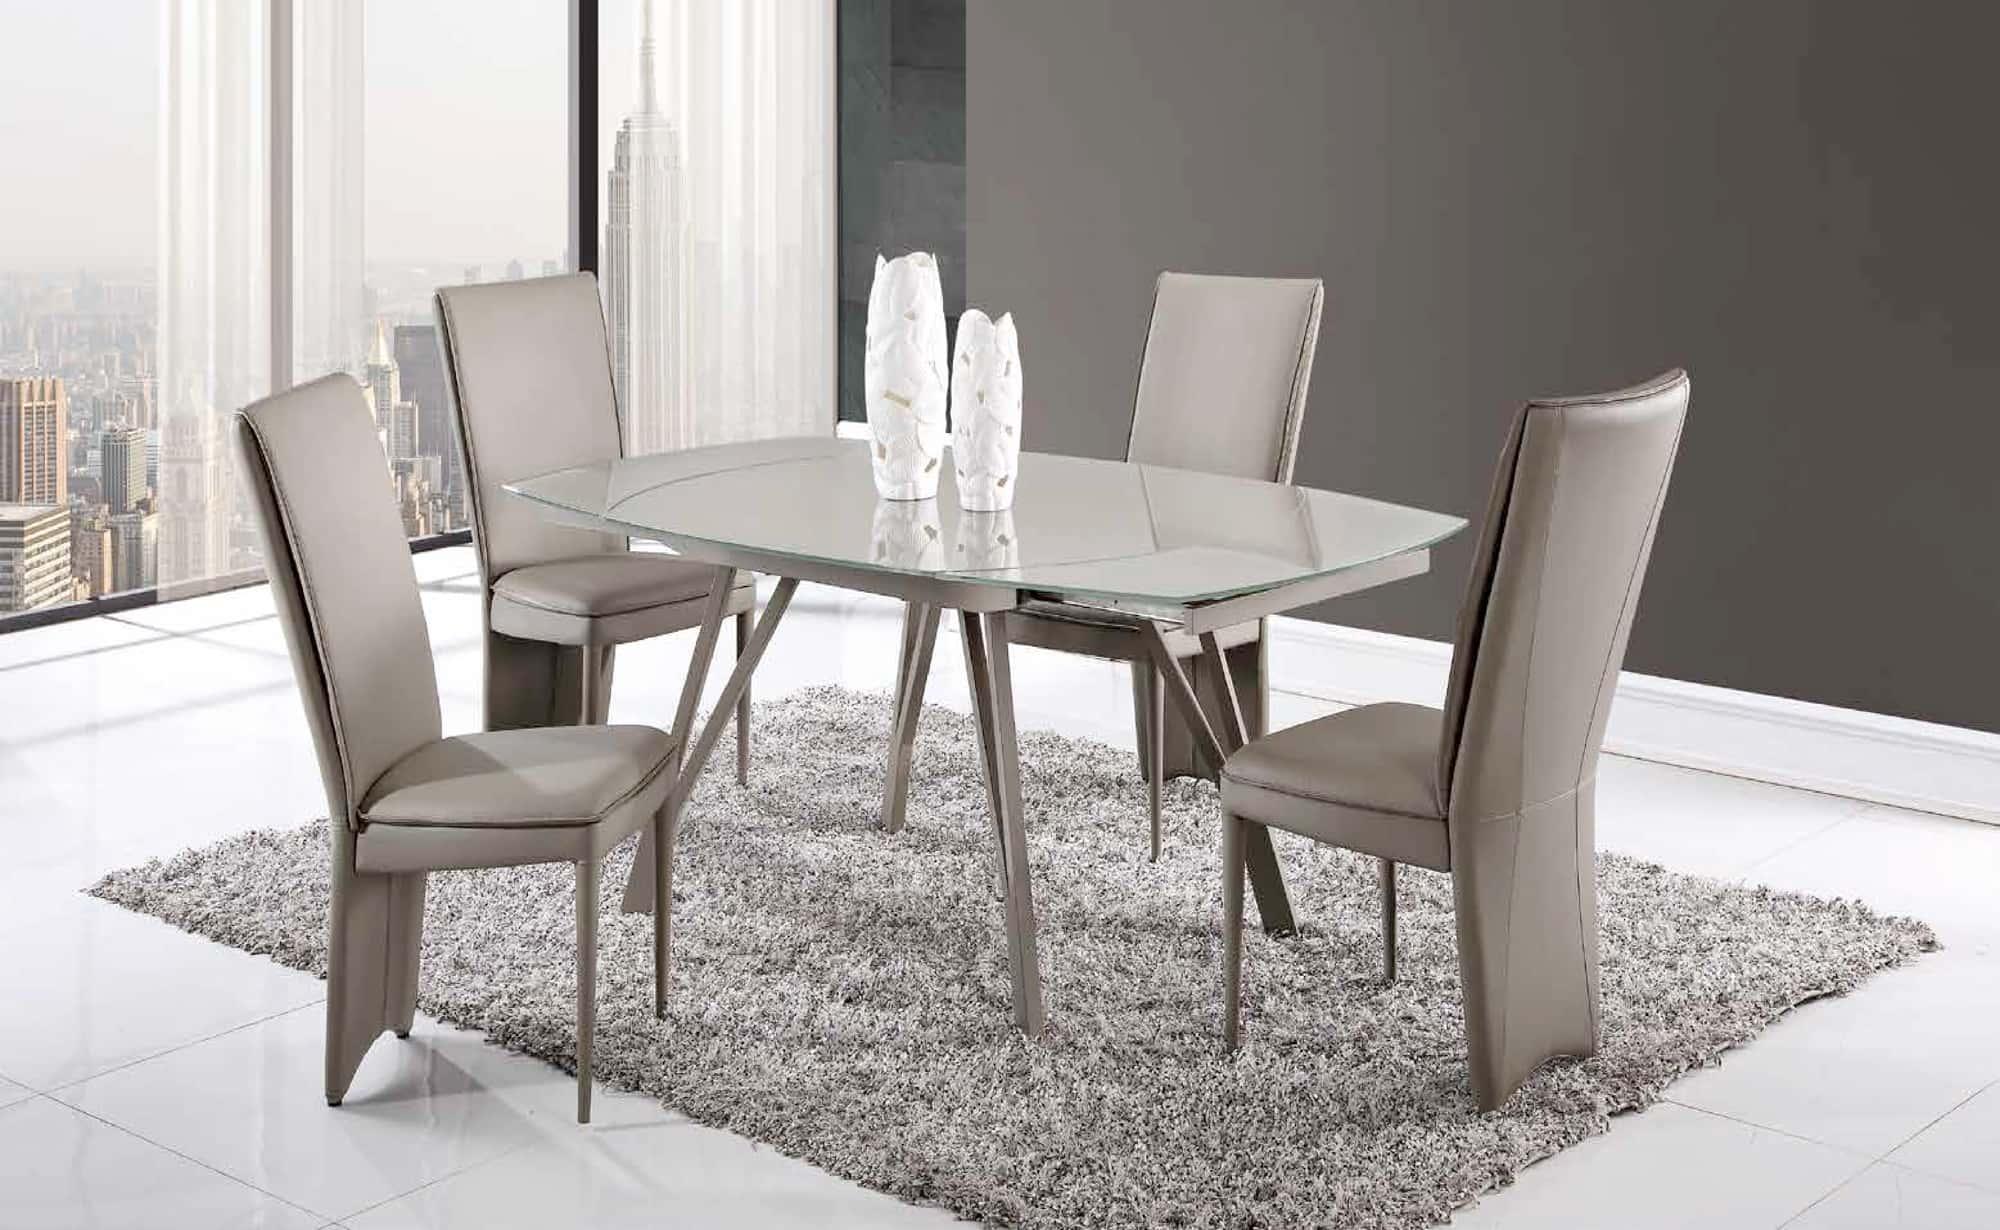 dining table d2177dt champagne glass top by global furniture. Black Bedroom Furniture Sets. Home Design Ideas